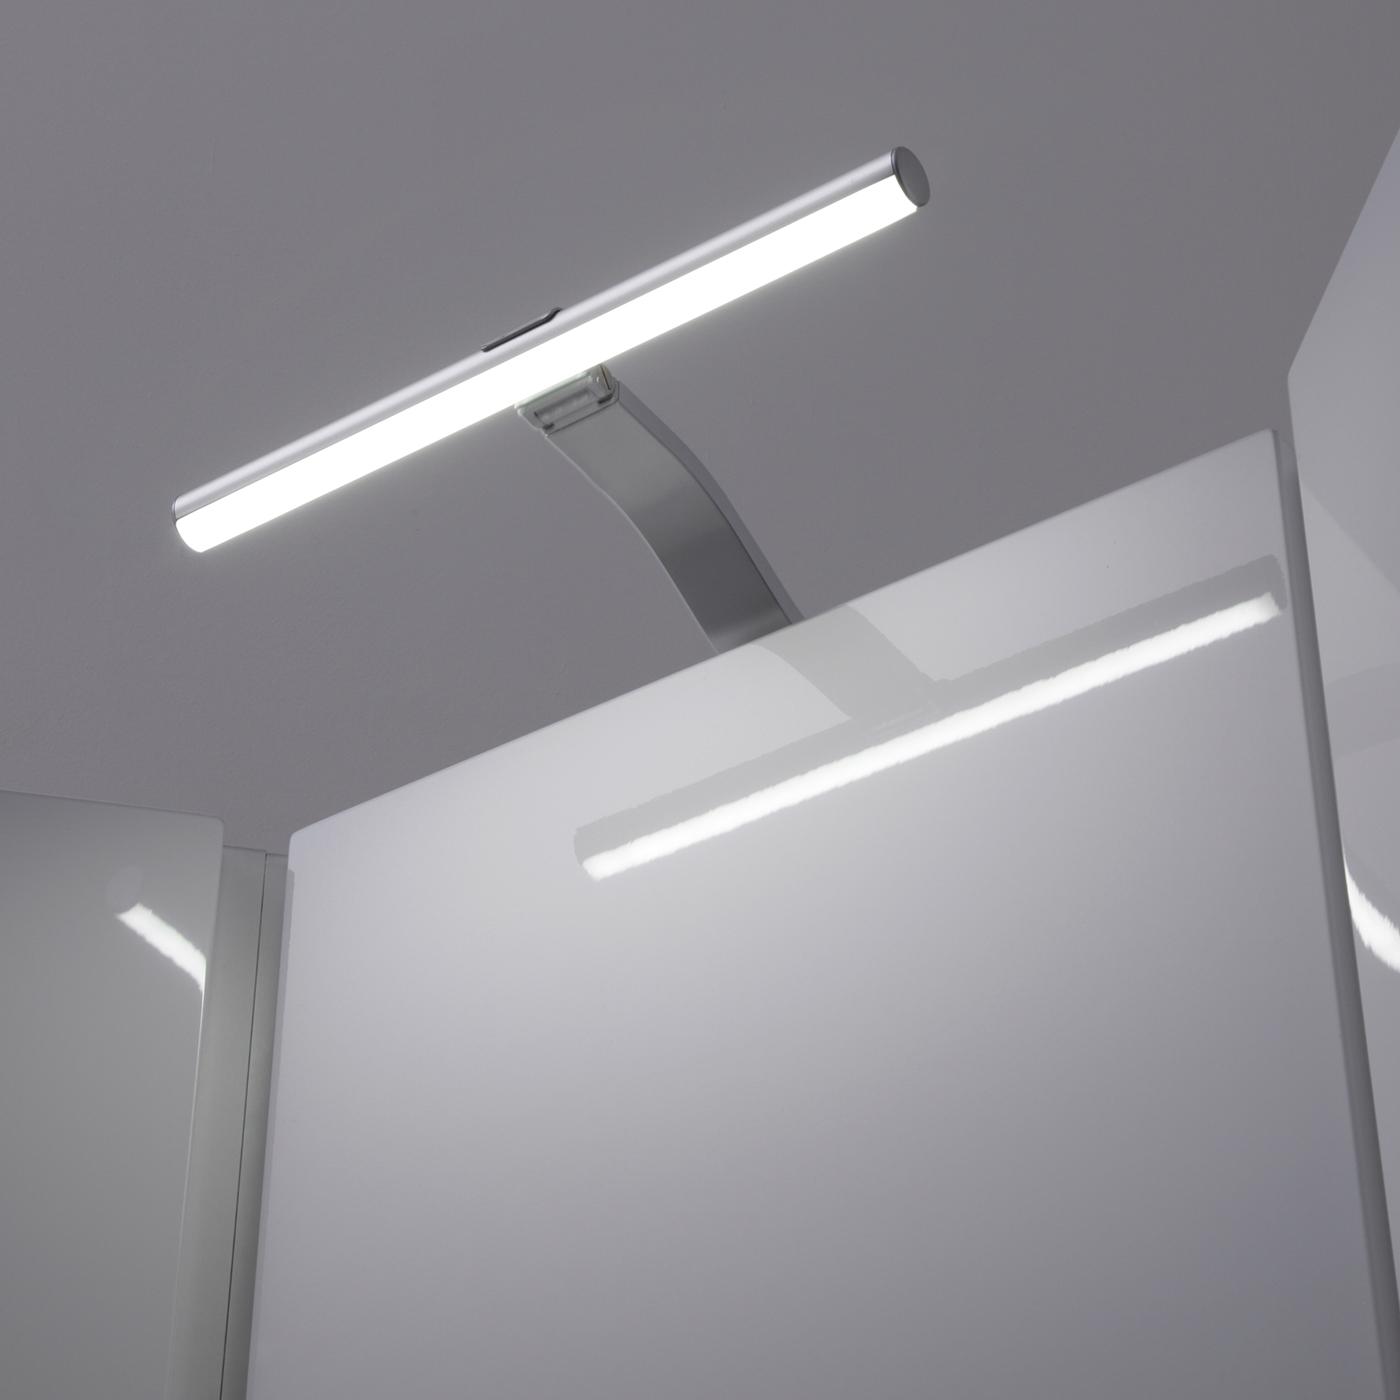 1 x 3.3W Ronde LED Kastverlichting inclusief Stroomtoevoer